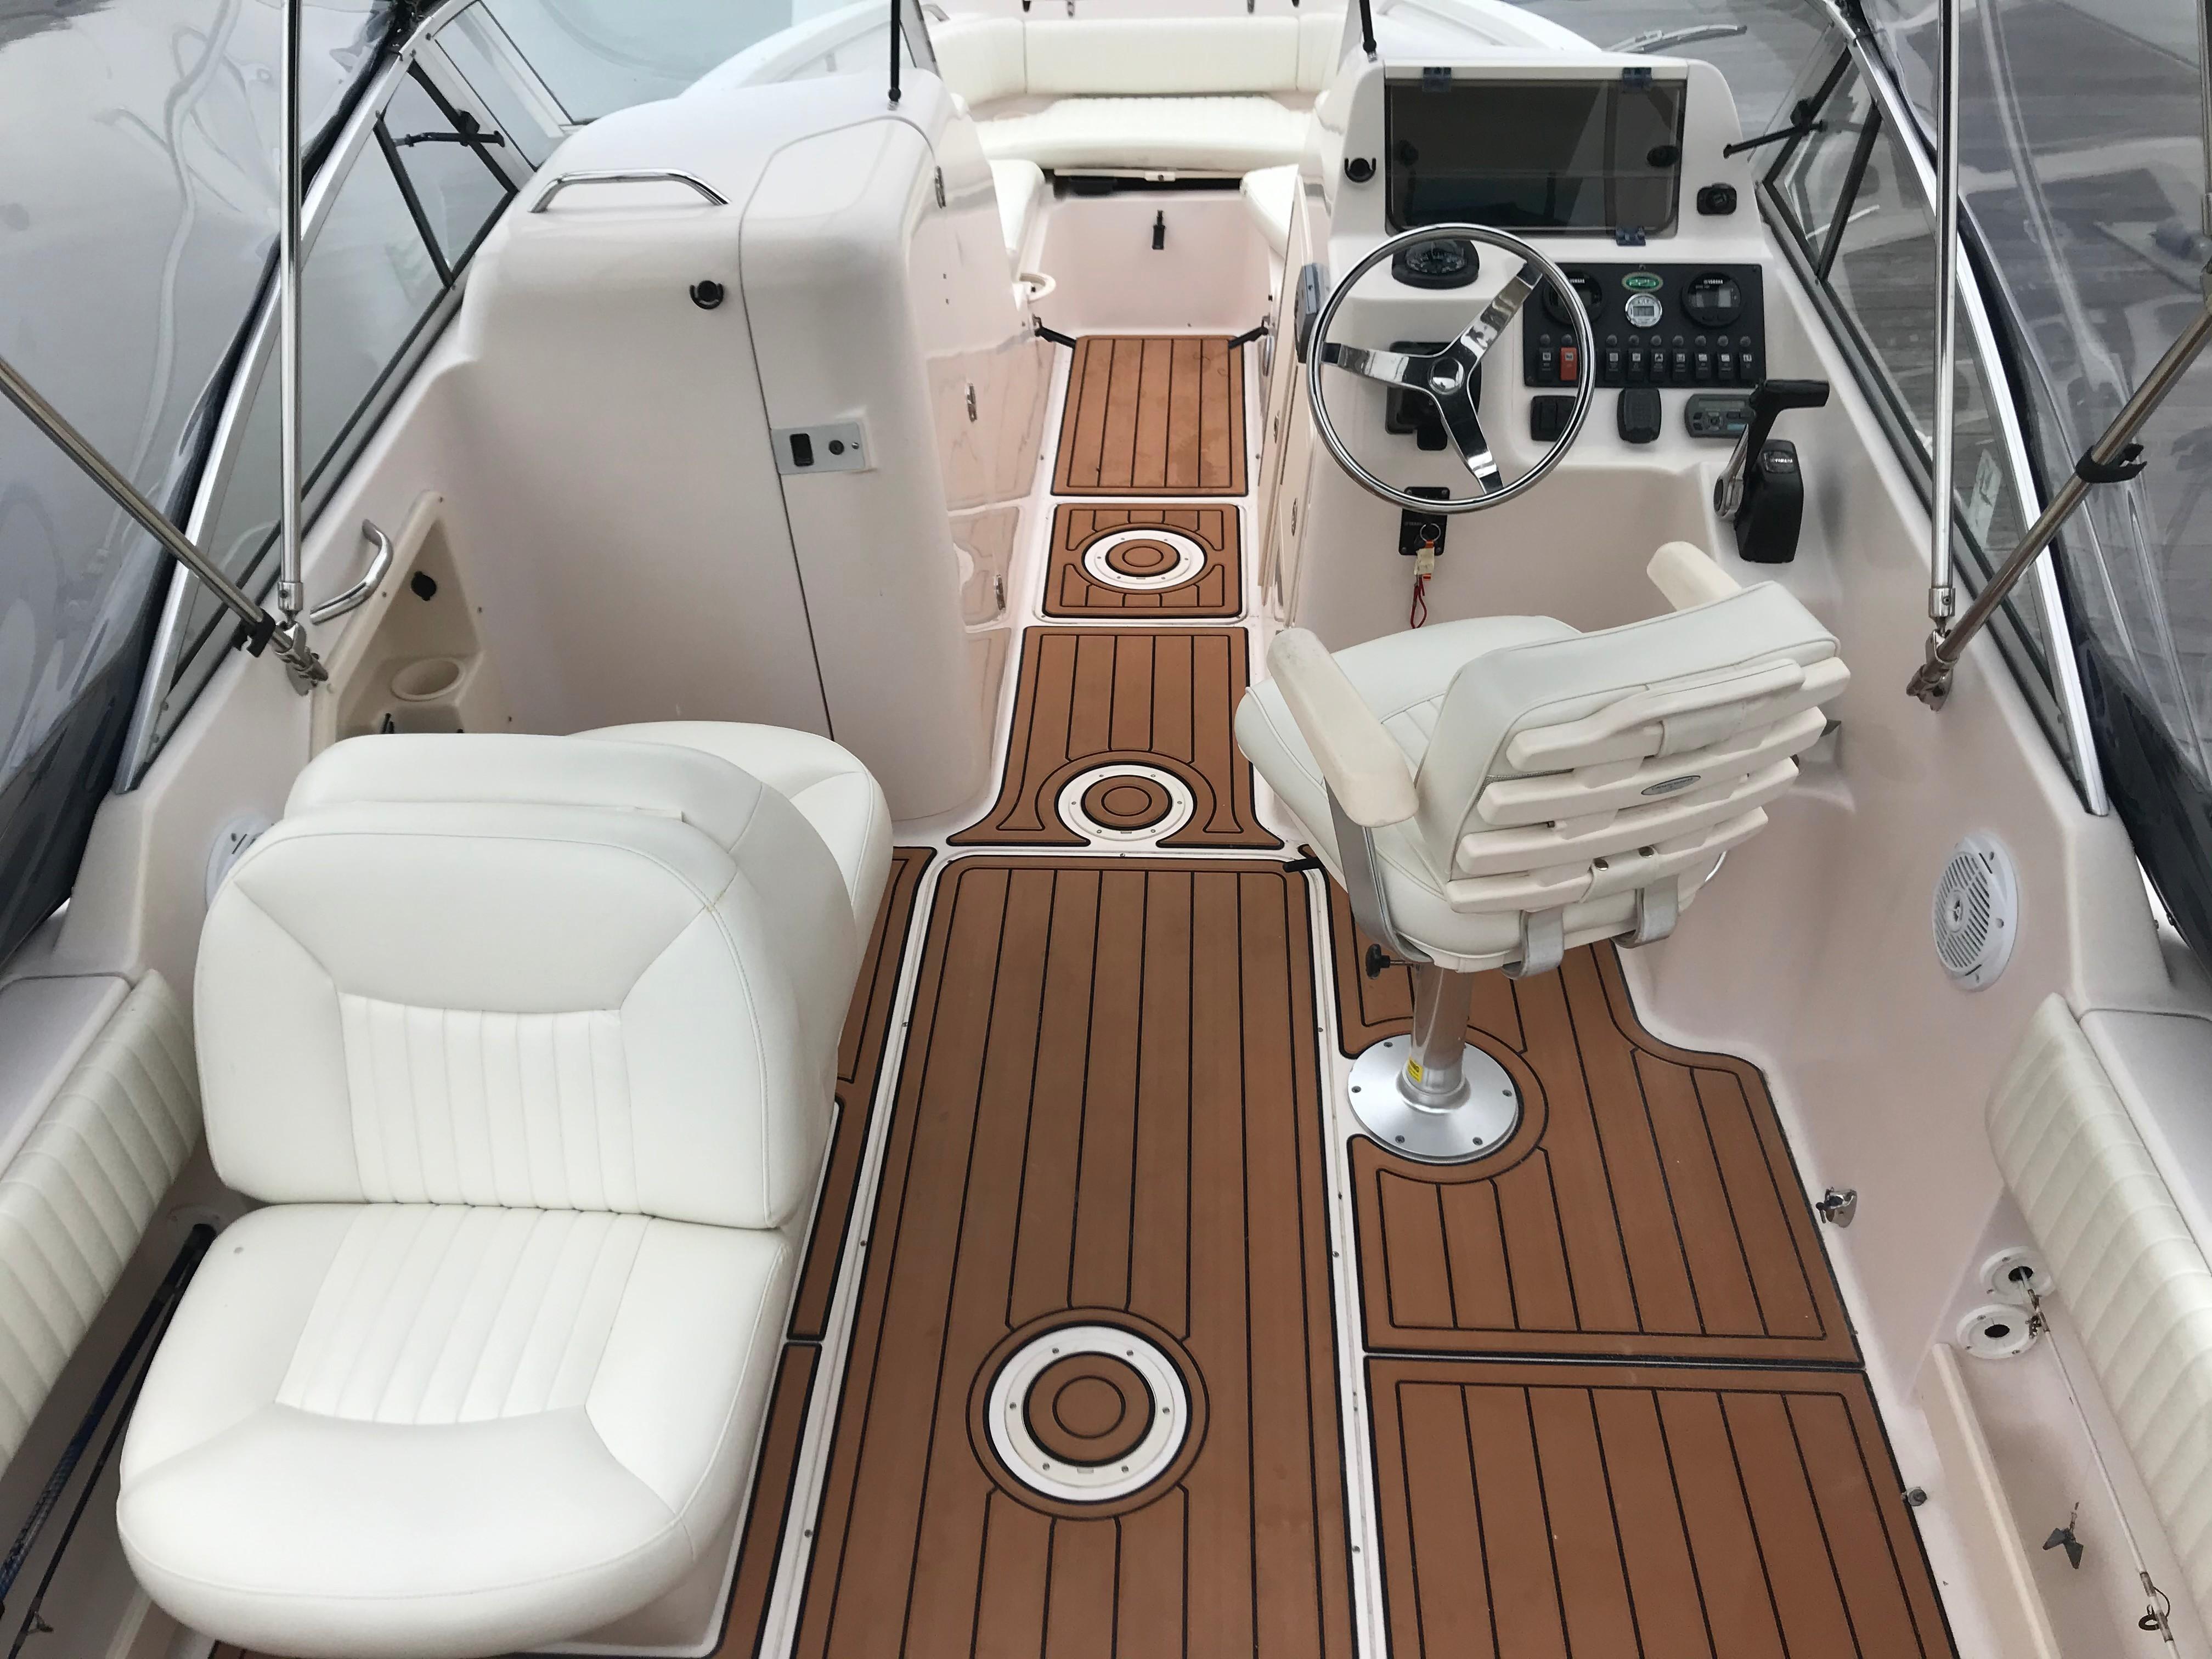 Grady-white 225 Tournament Dual Console - Interior looking forward/Sea Deck